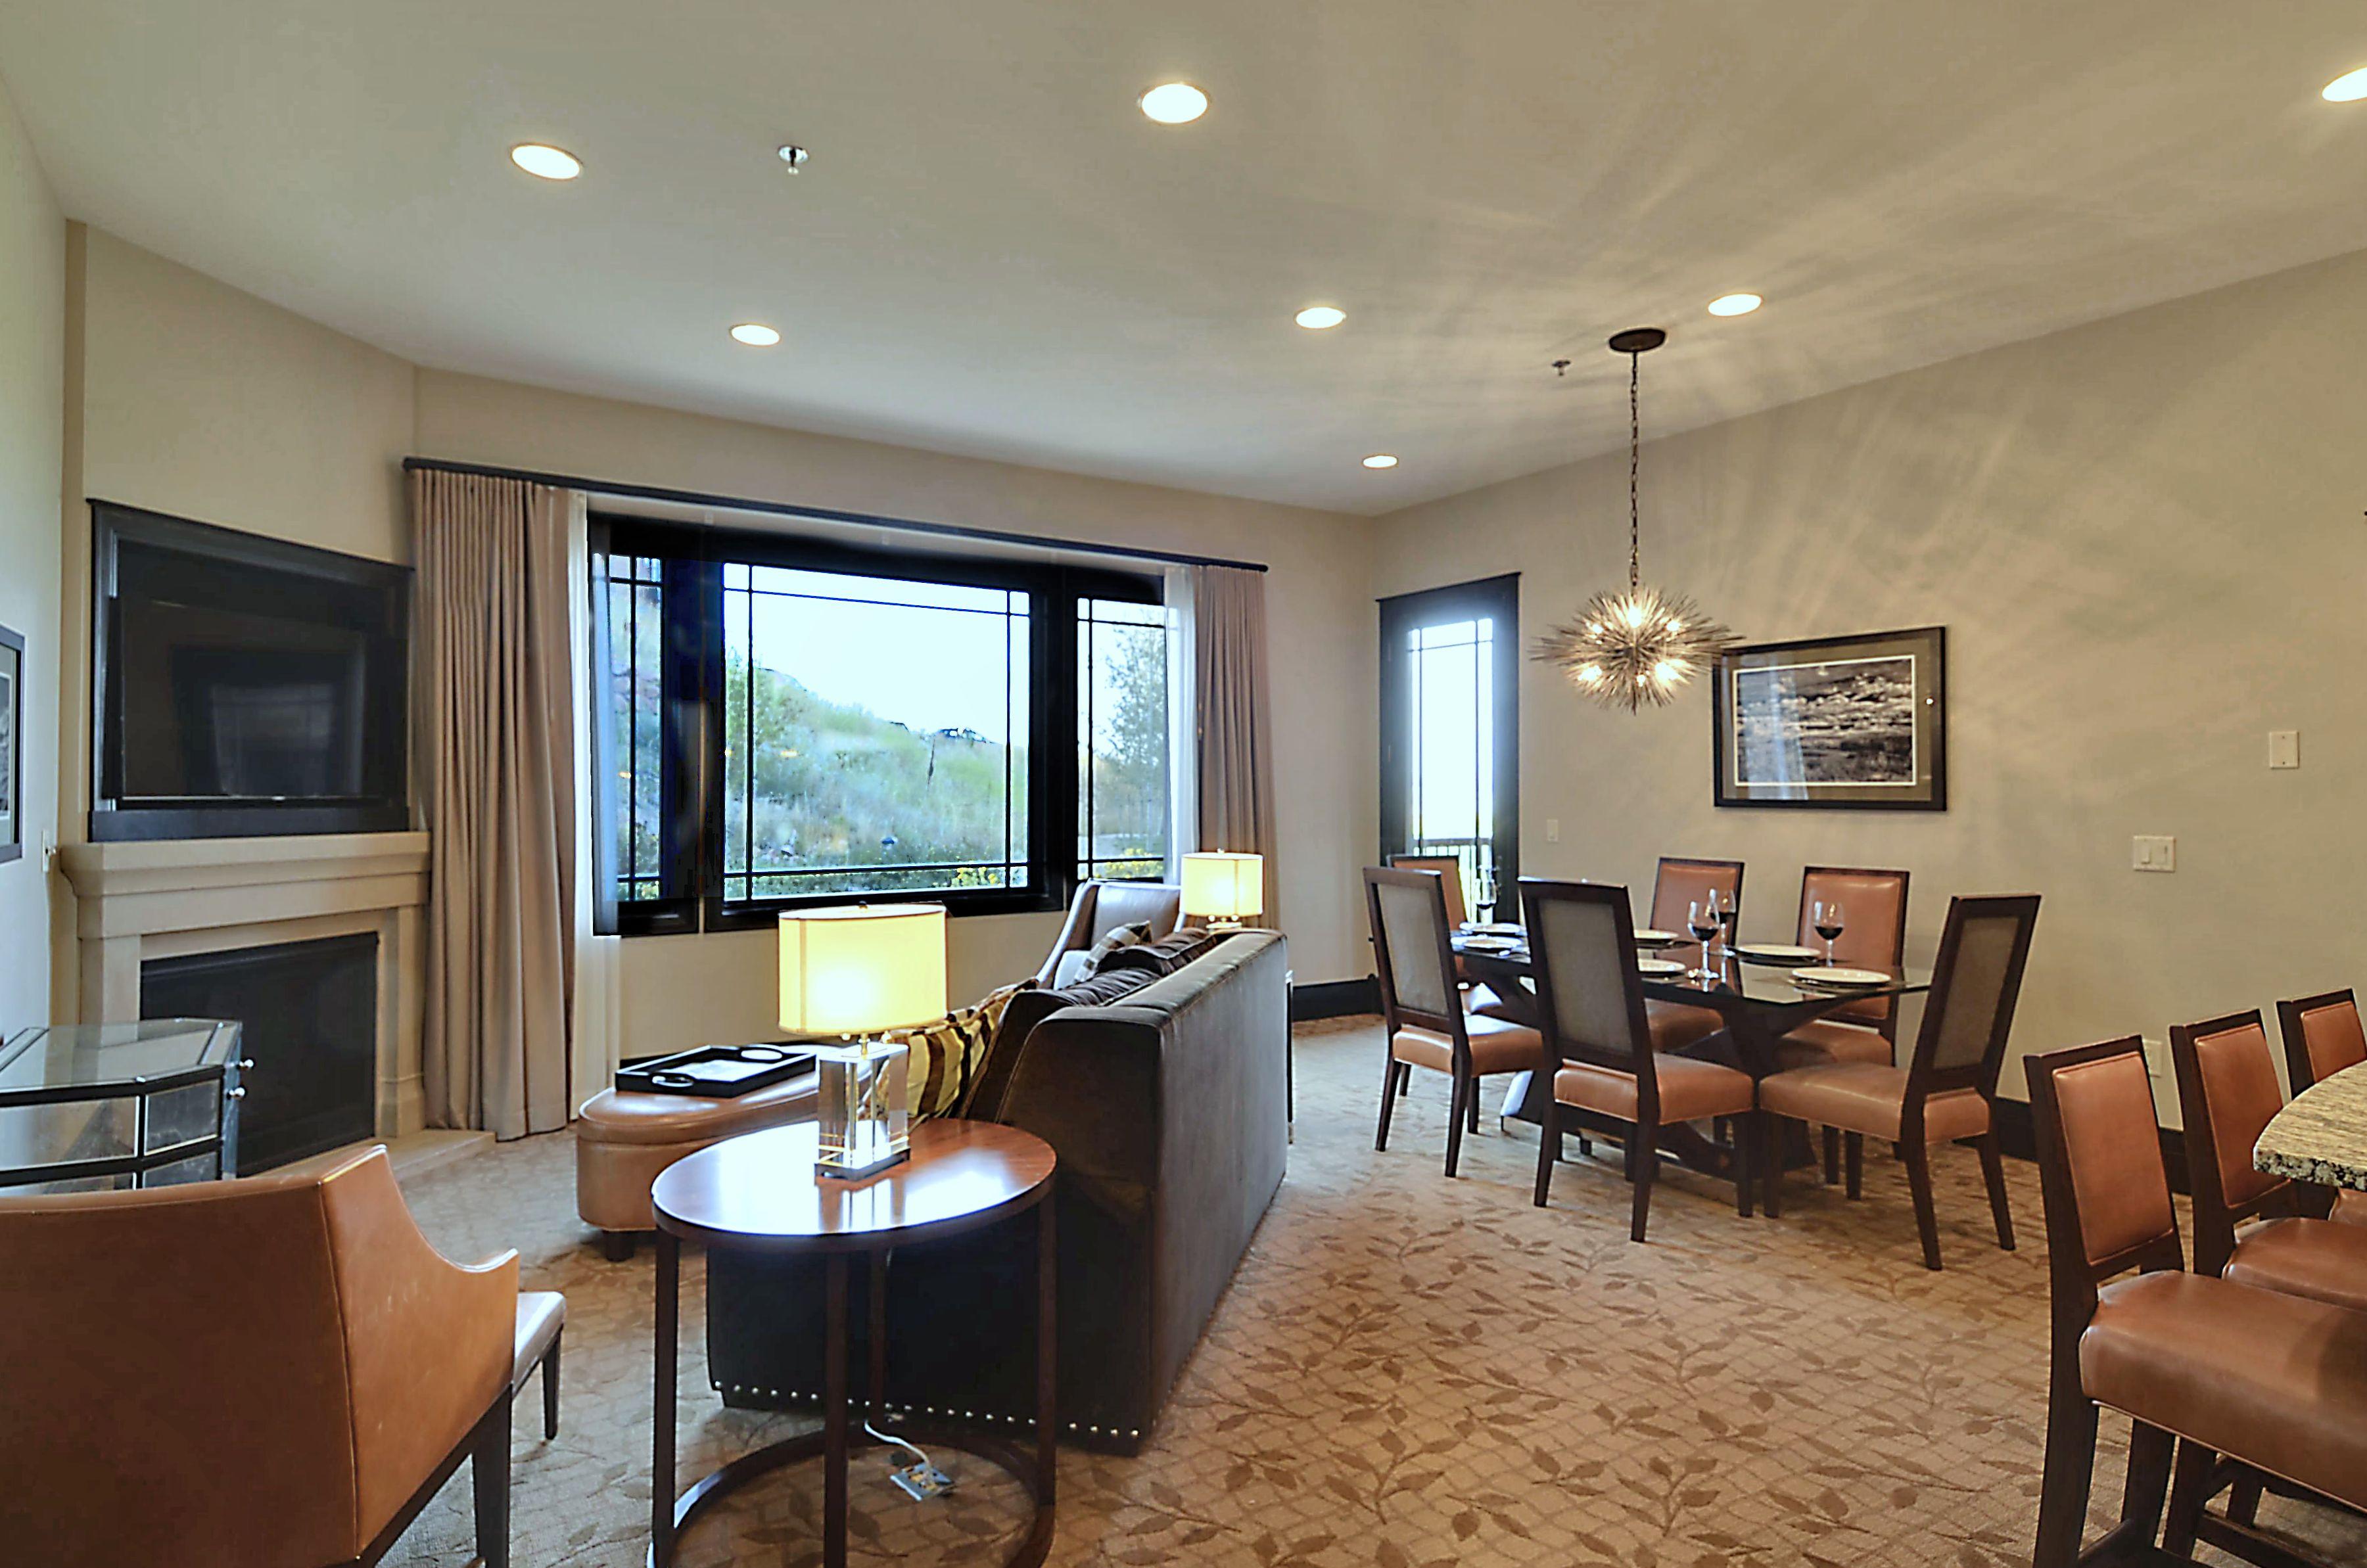 5 Star Luxury Hotel - 1 Bedroom Residence